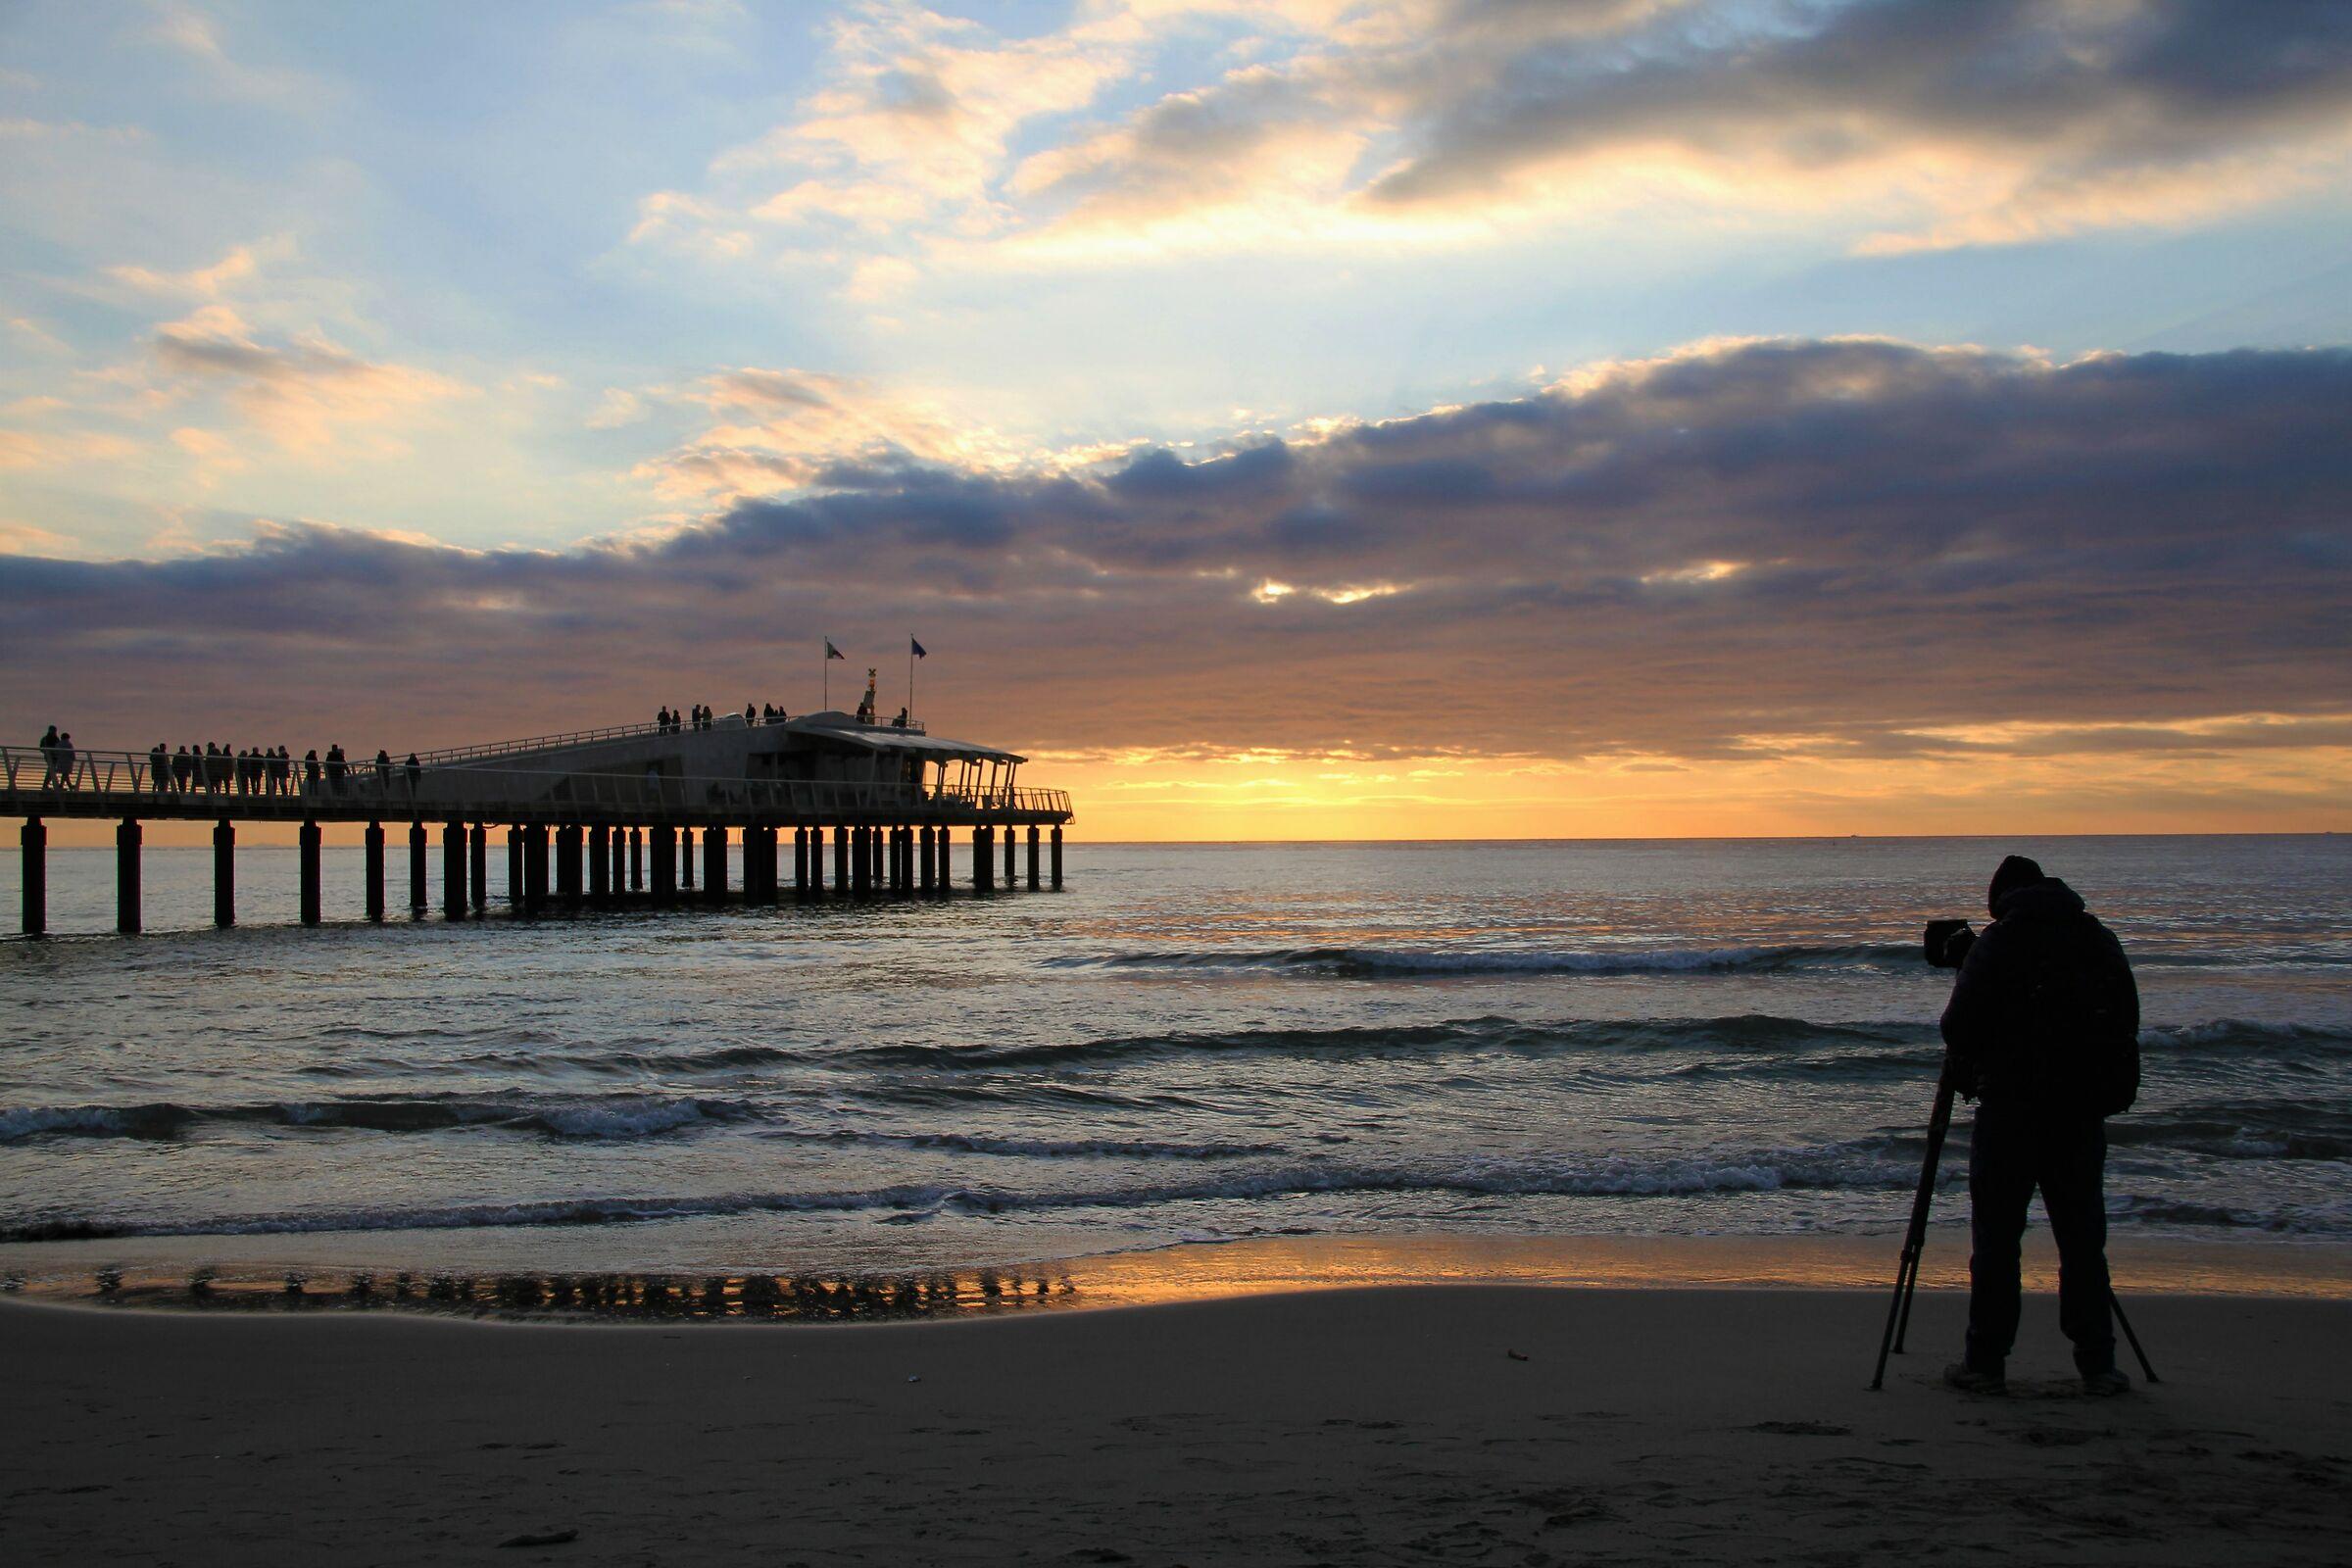 Sunset Photographers...